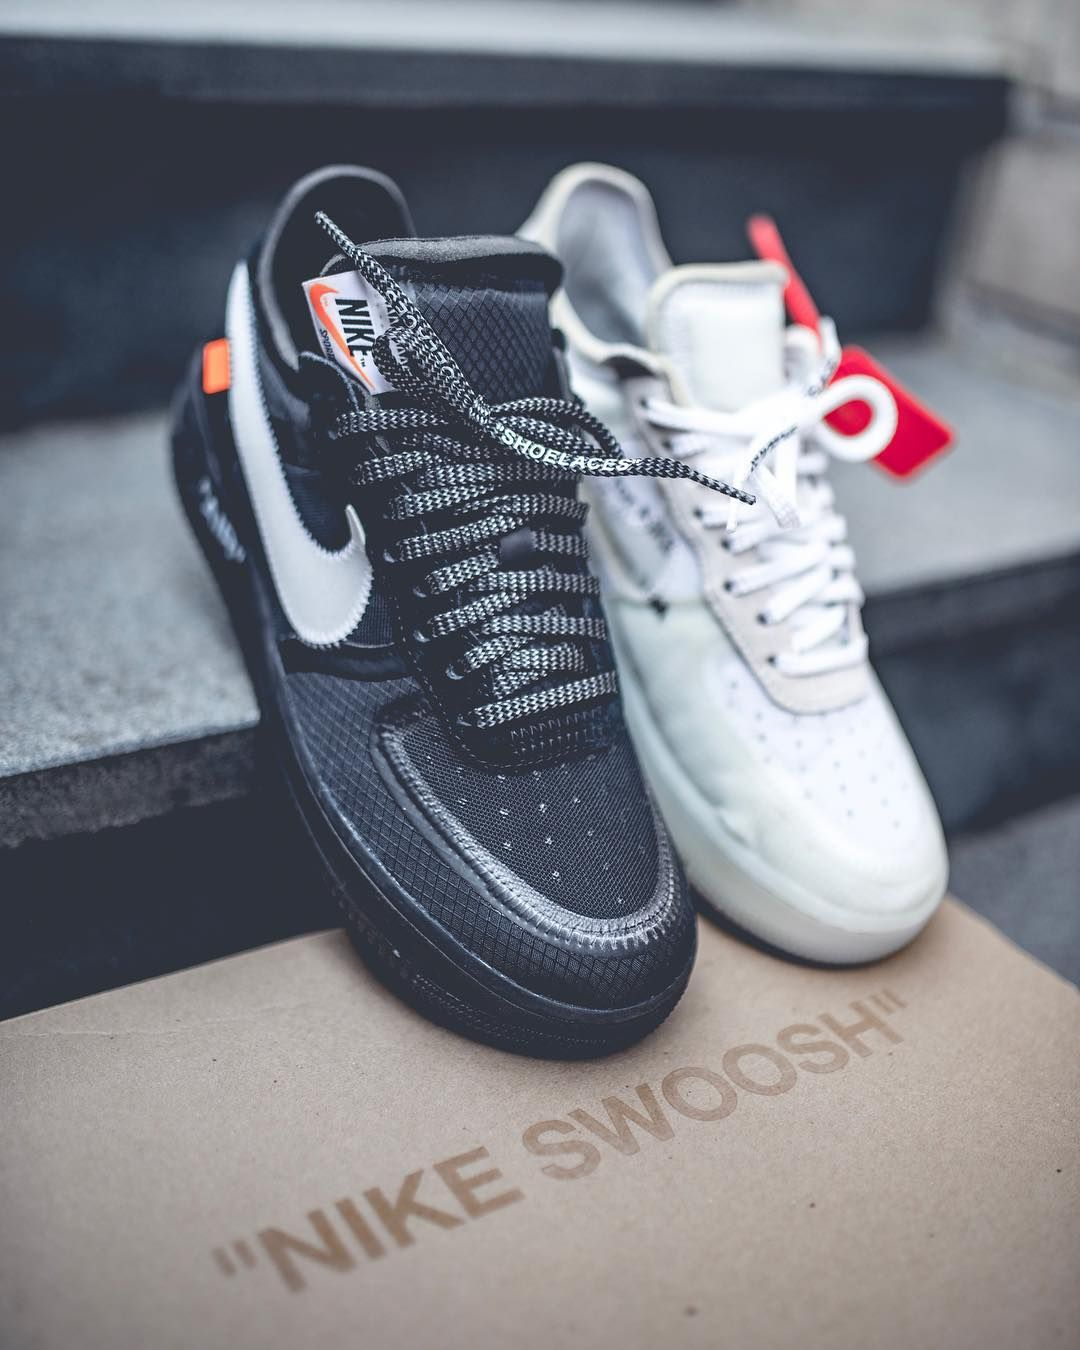 Off White X Nike Alle News Und Releasedates Der Beruchtigten Collabo Nike Hype Shoes Nike Fashion